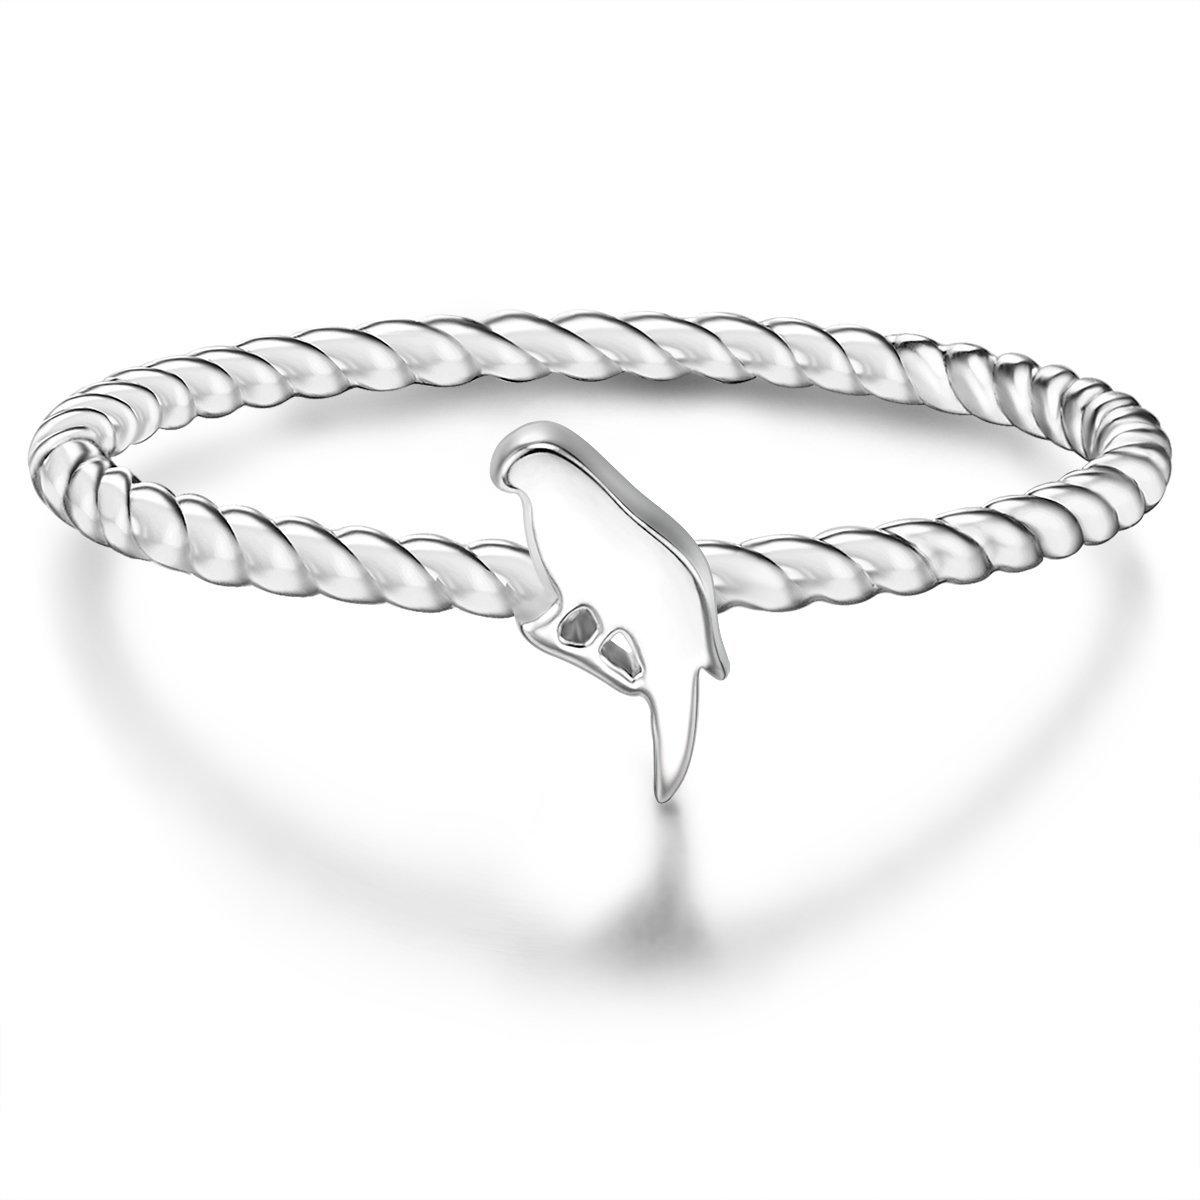 Glanzstücke München Ring Sterling Sterling Silber 925-// rosévergoldet Zirkonia